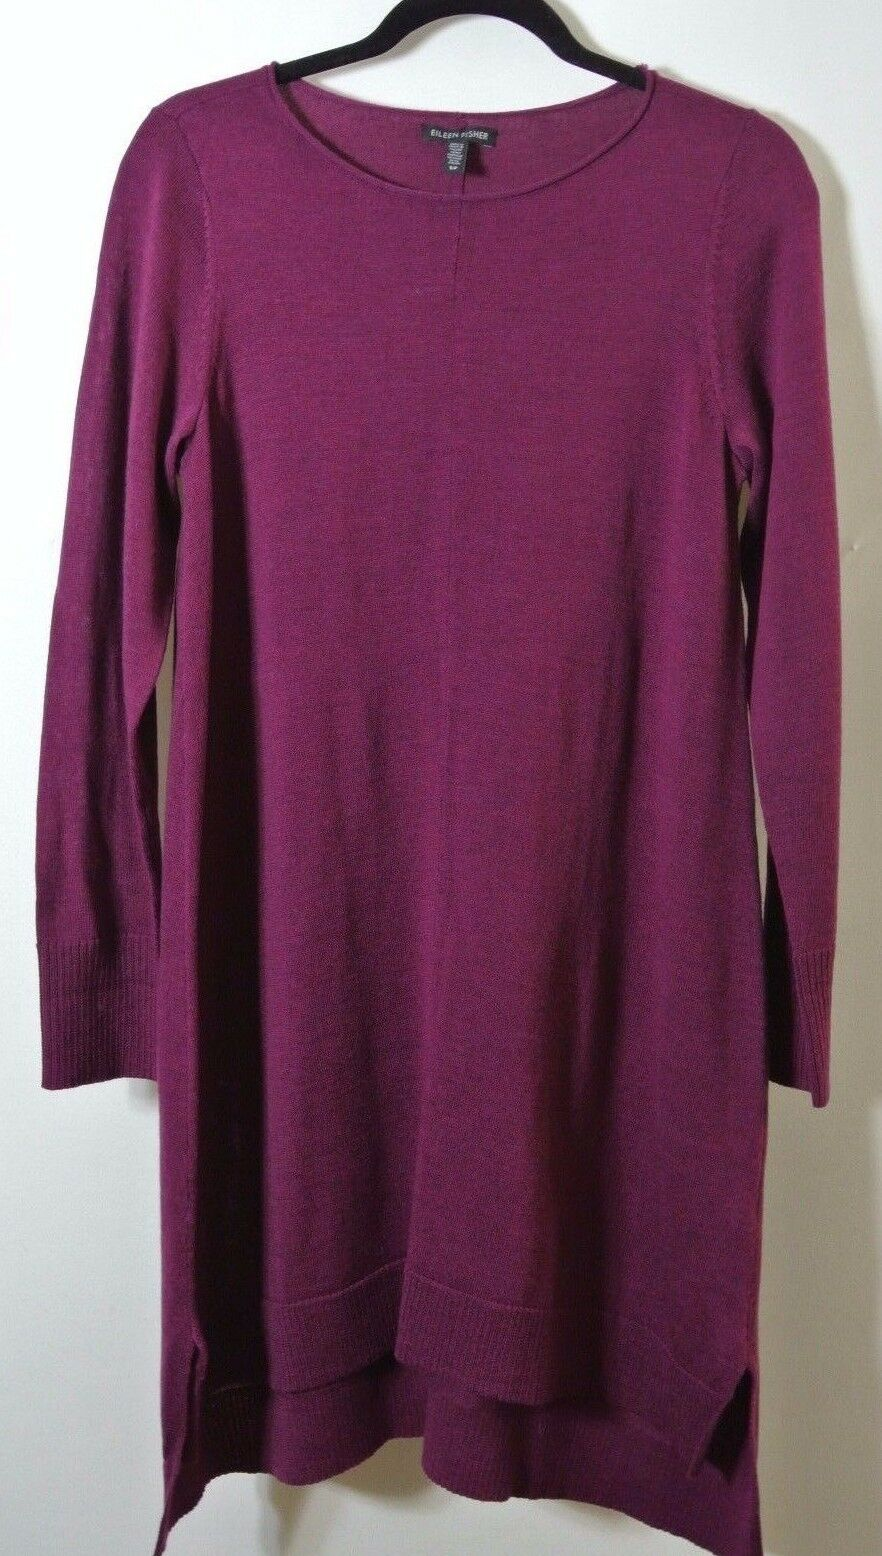 NEW Eileen Fisher Merino Wool Sweater Dress Dark Purple Size S